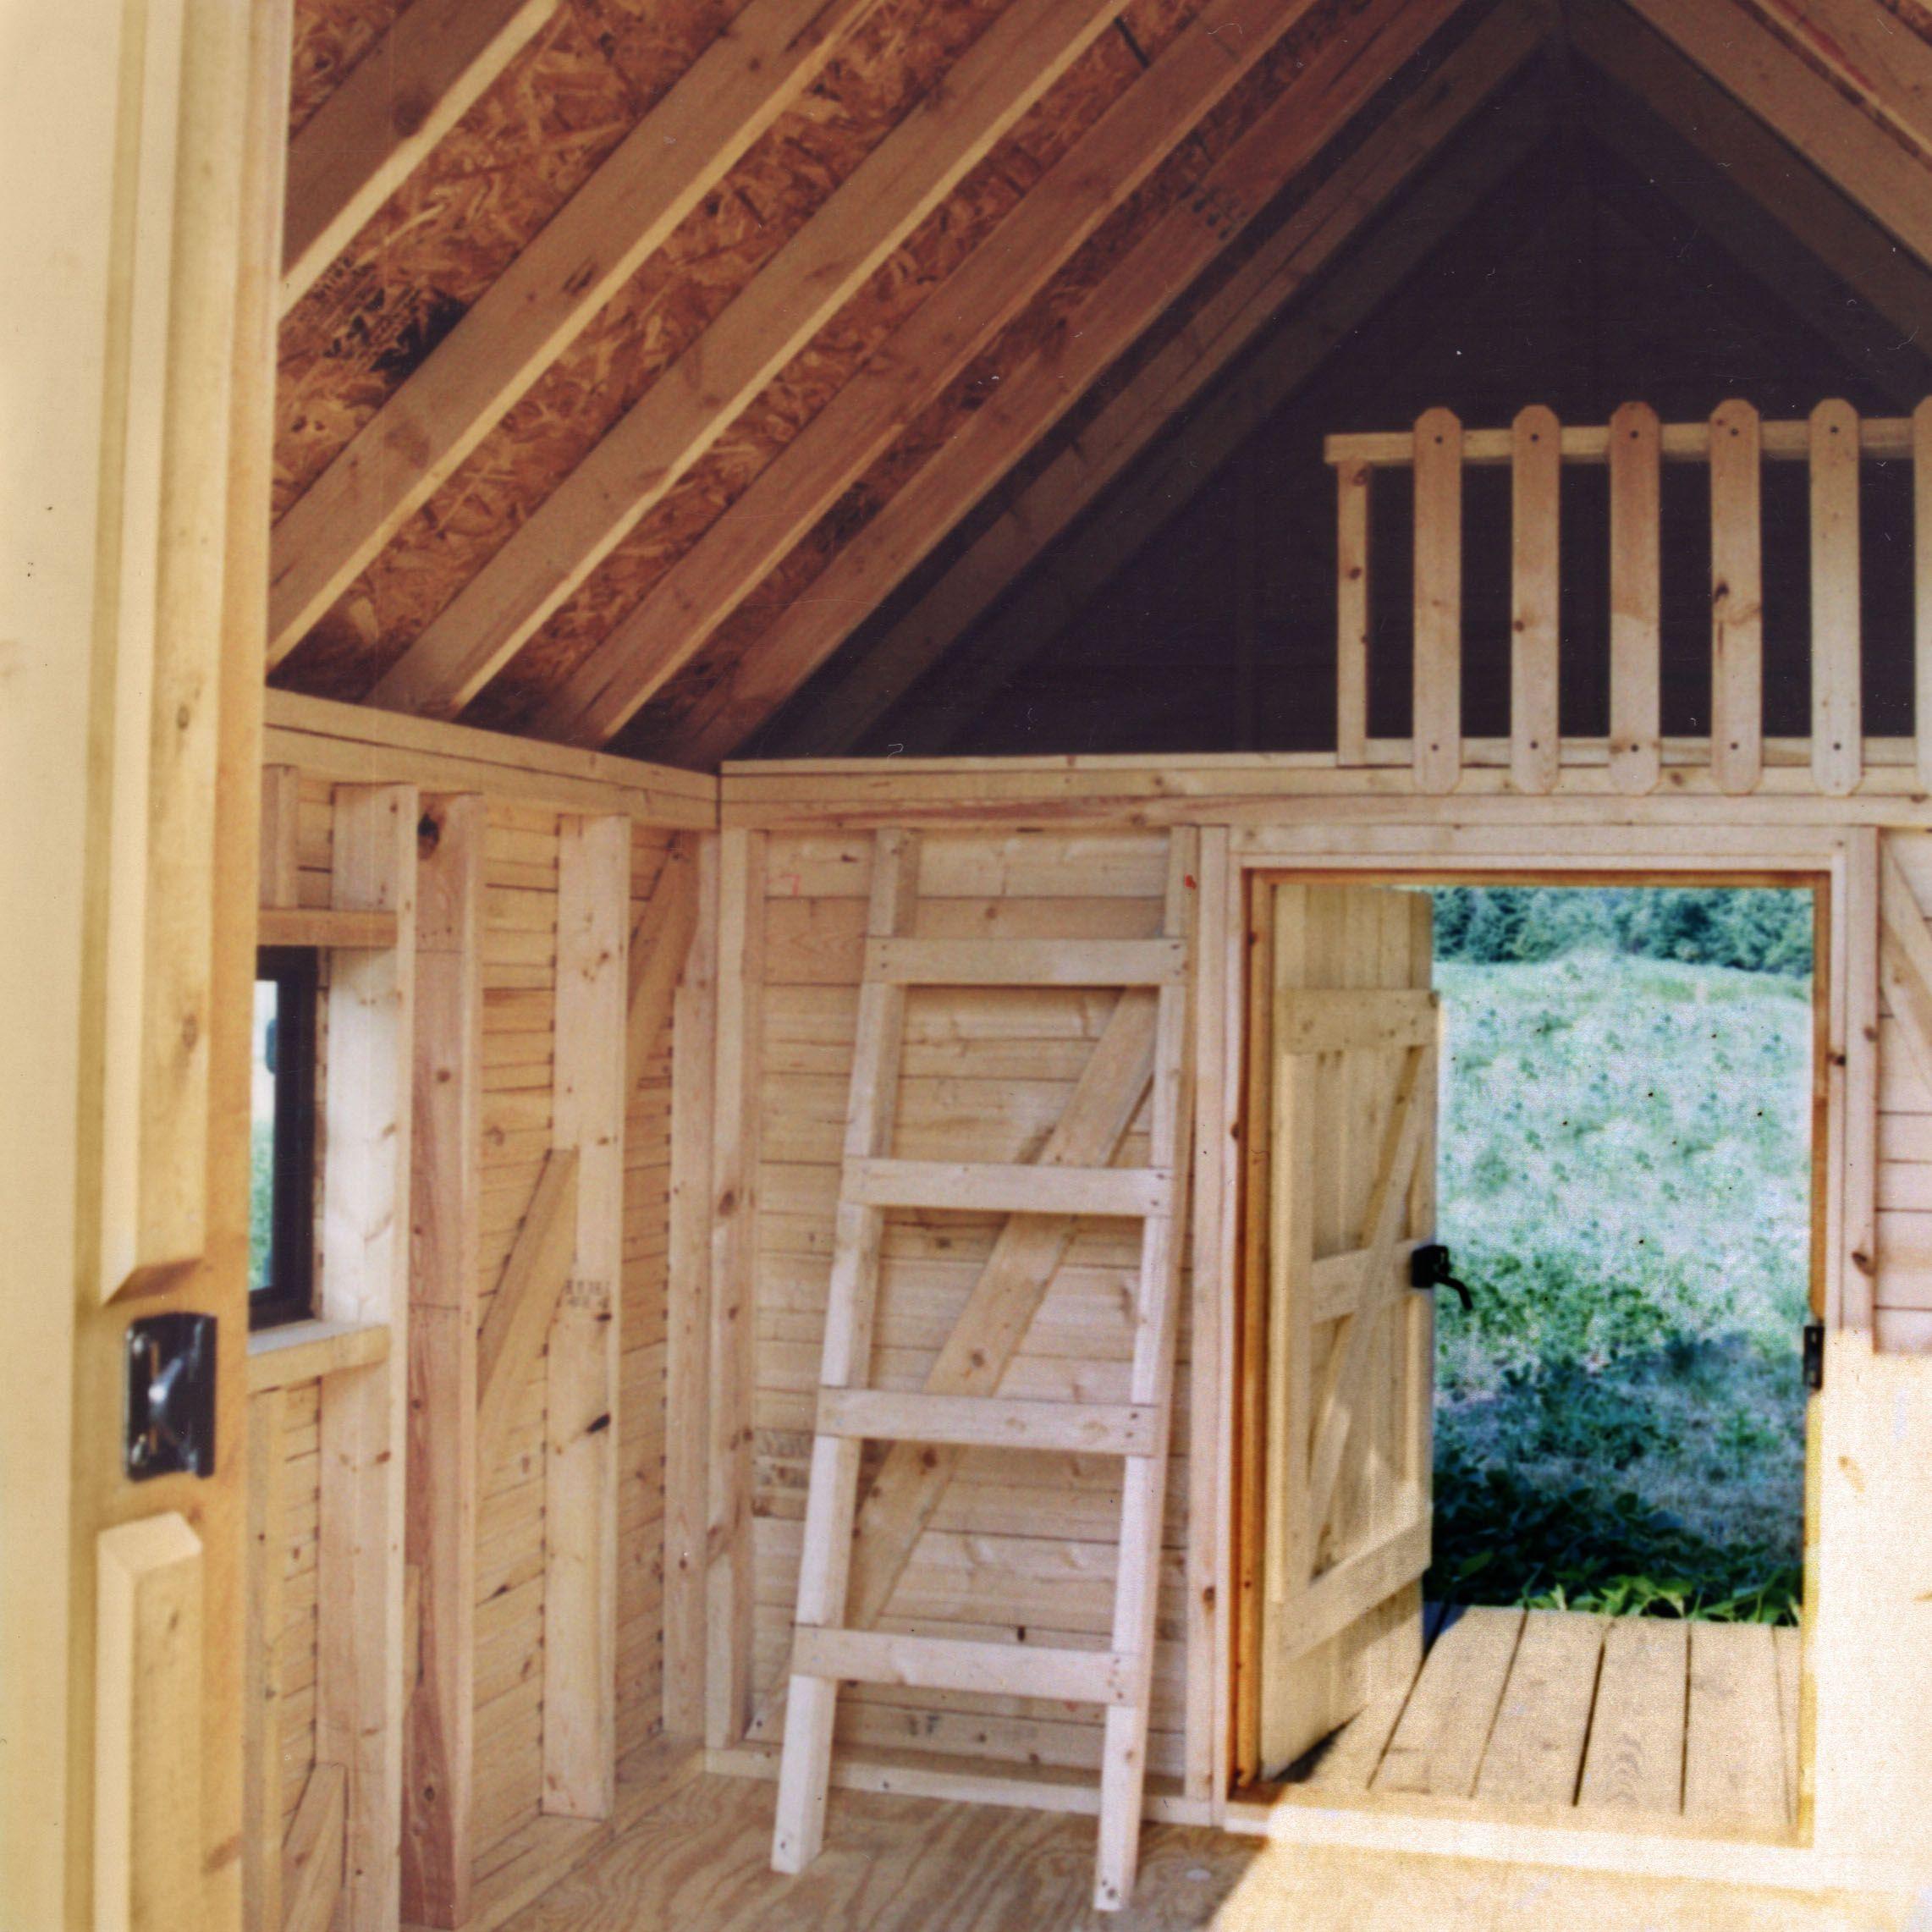 interior design ndsu - 1000+ images about frame ideas on Pinterest frame cabin, ...